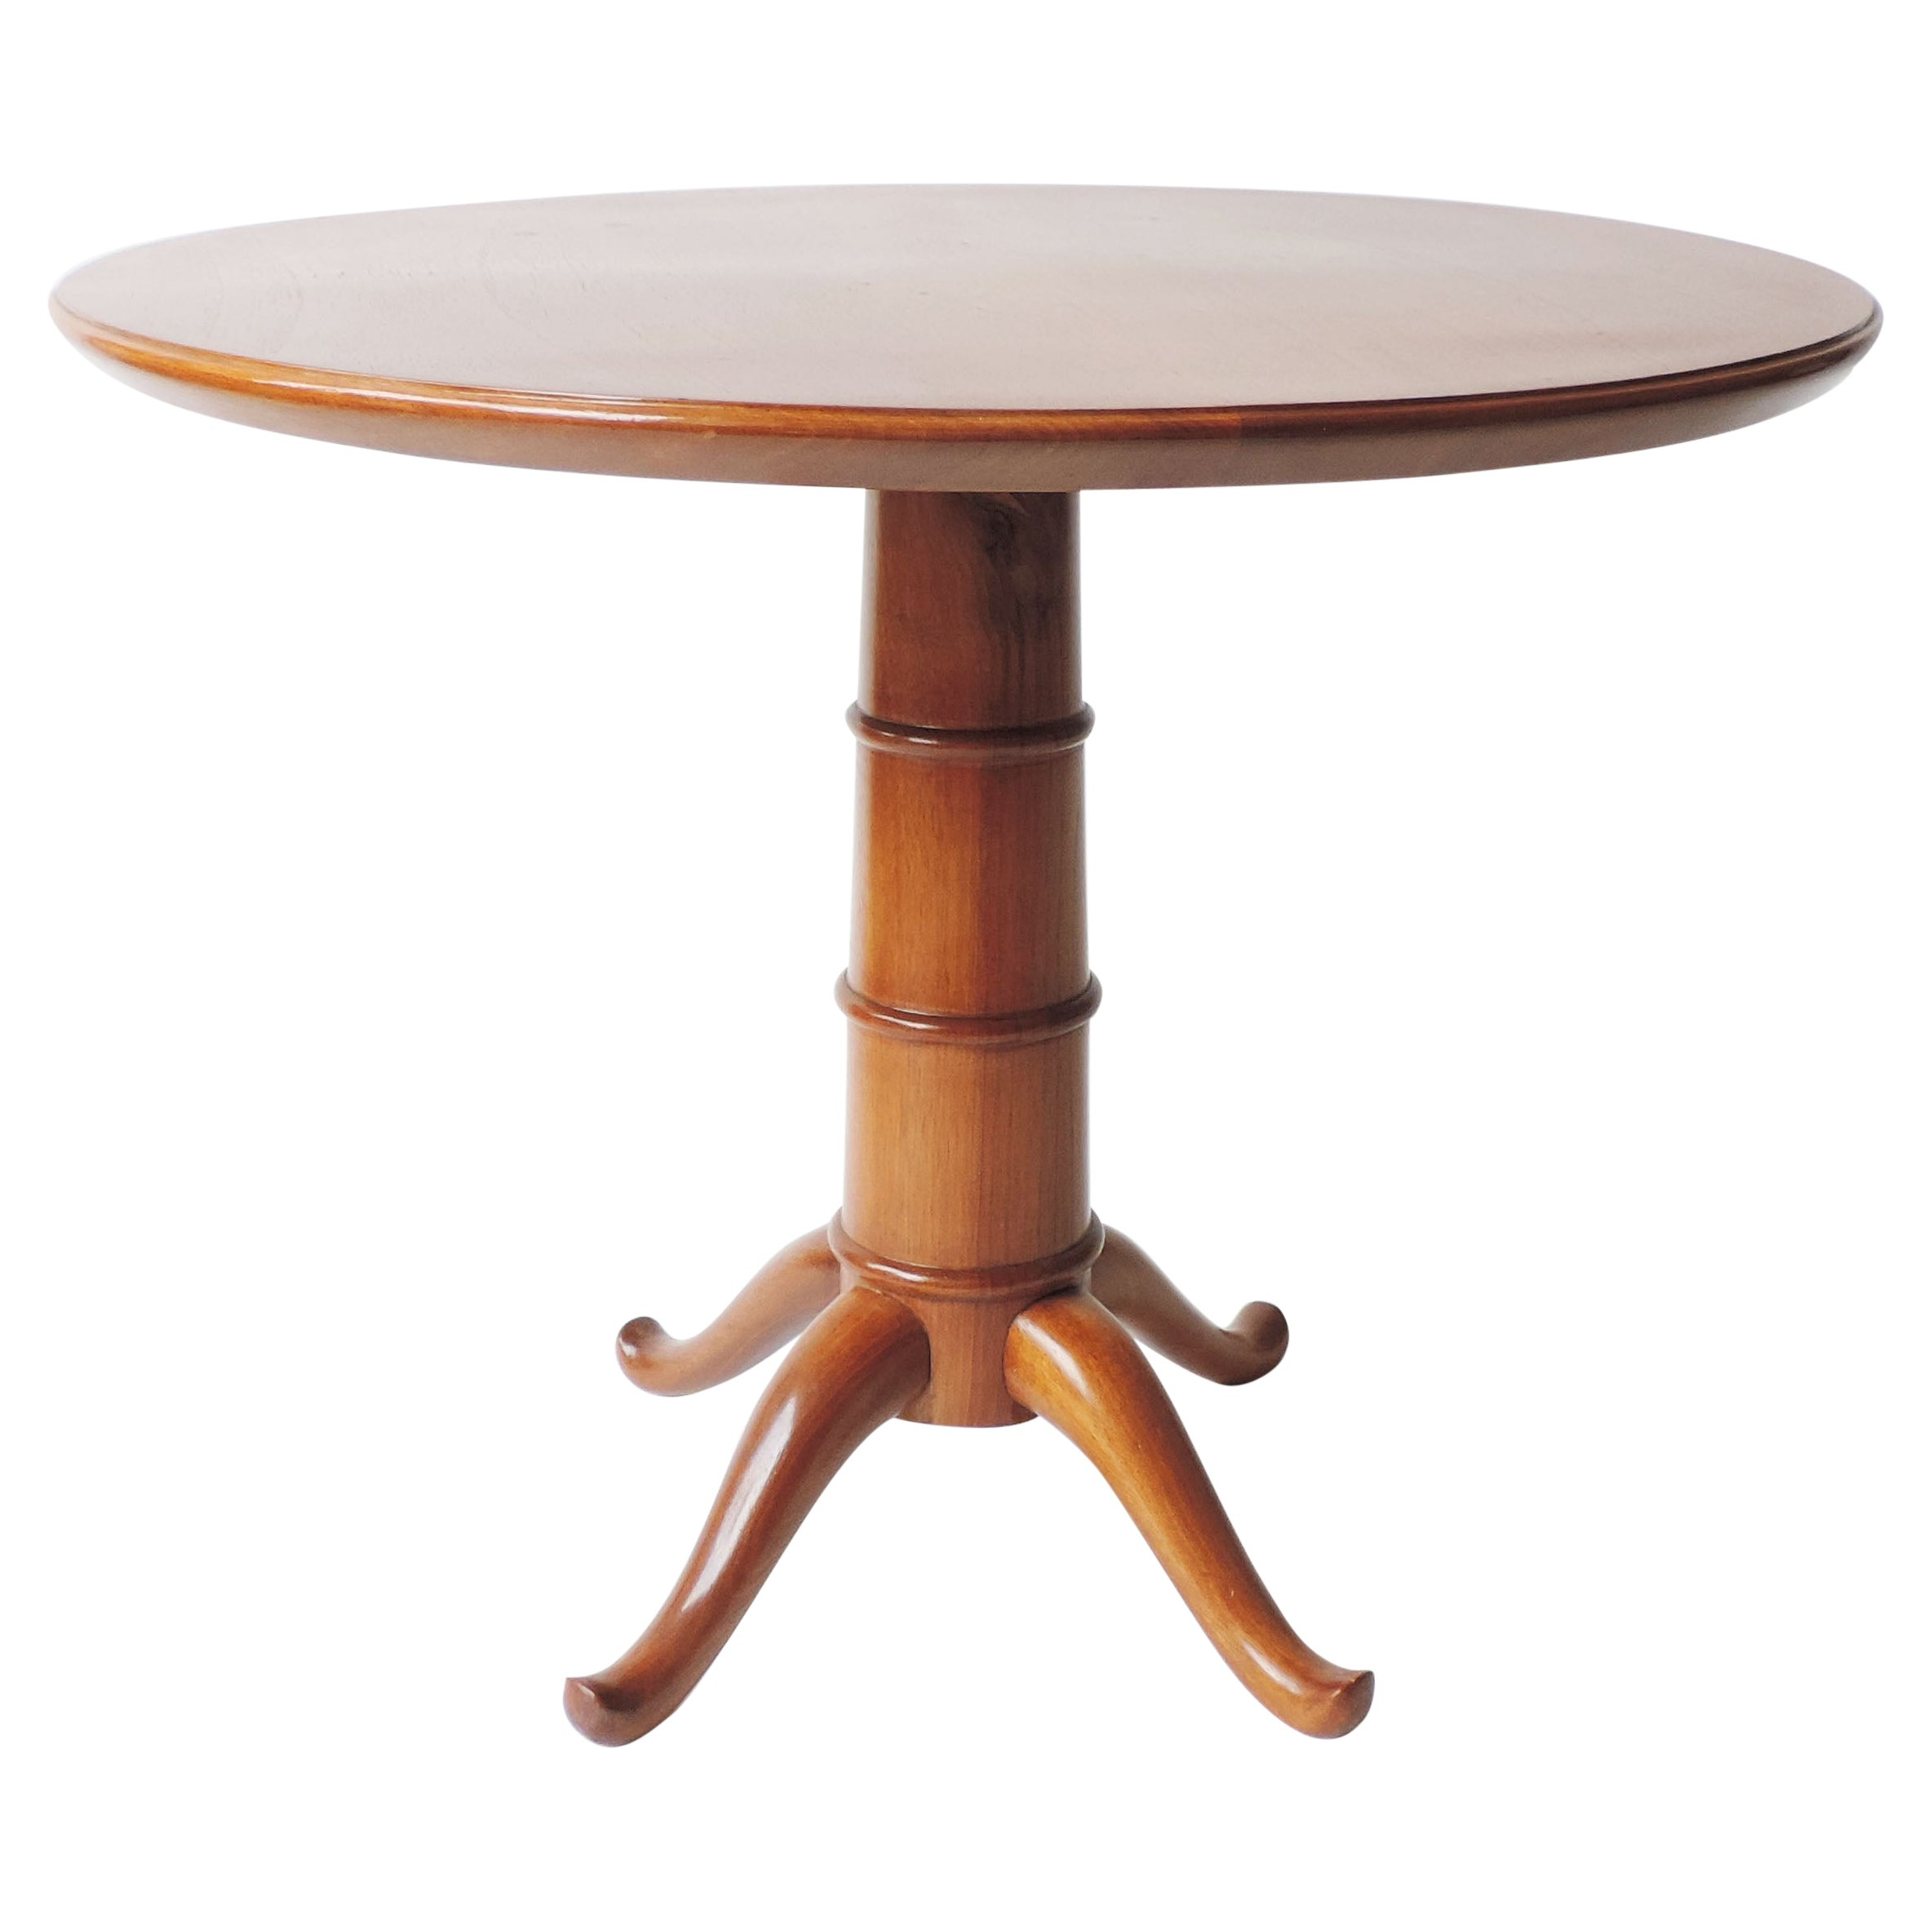 Paolo Buffa Wood Coffee Table, Italy 1940s